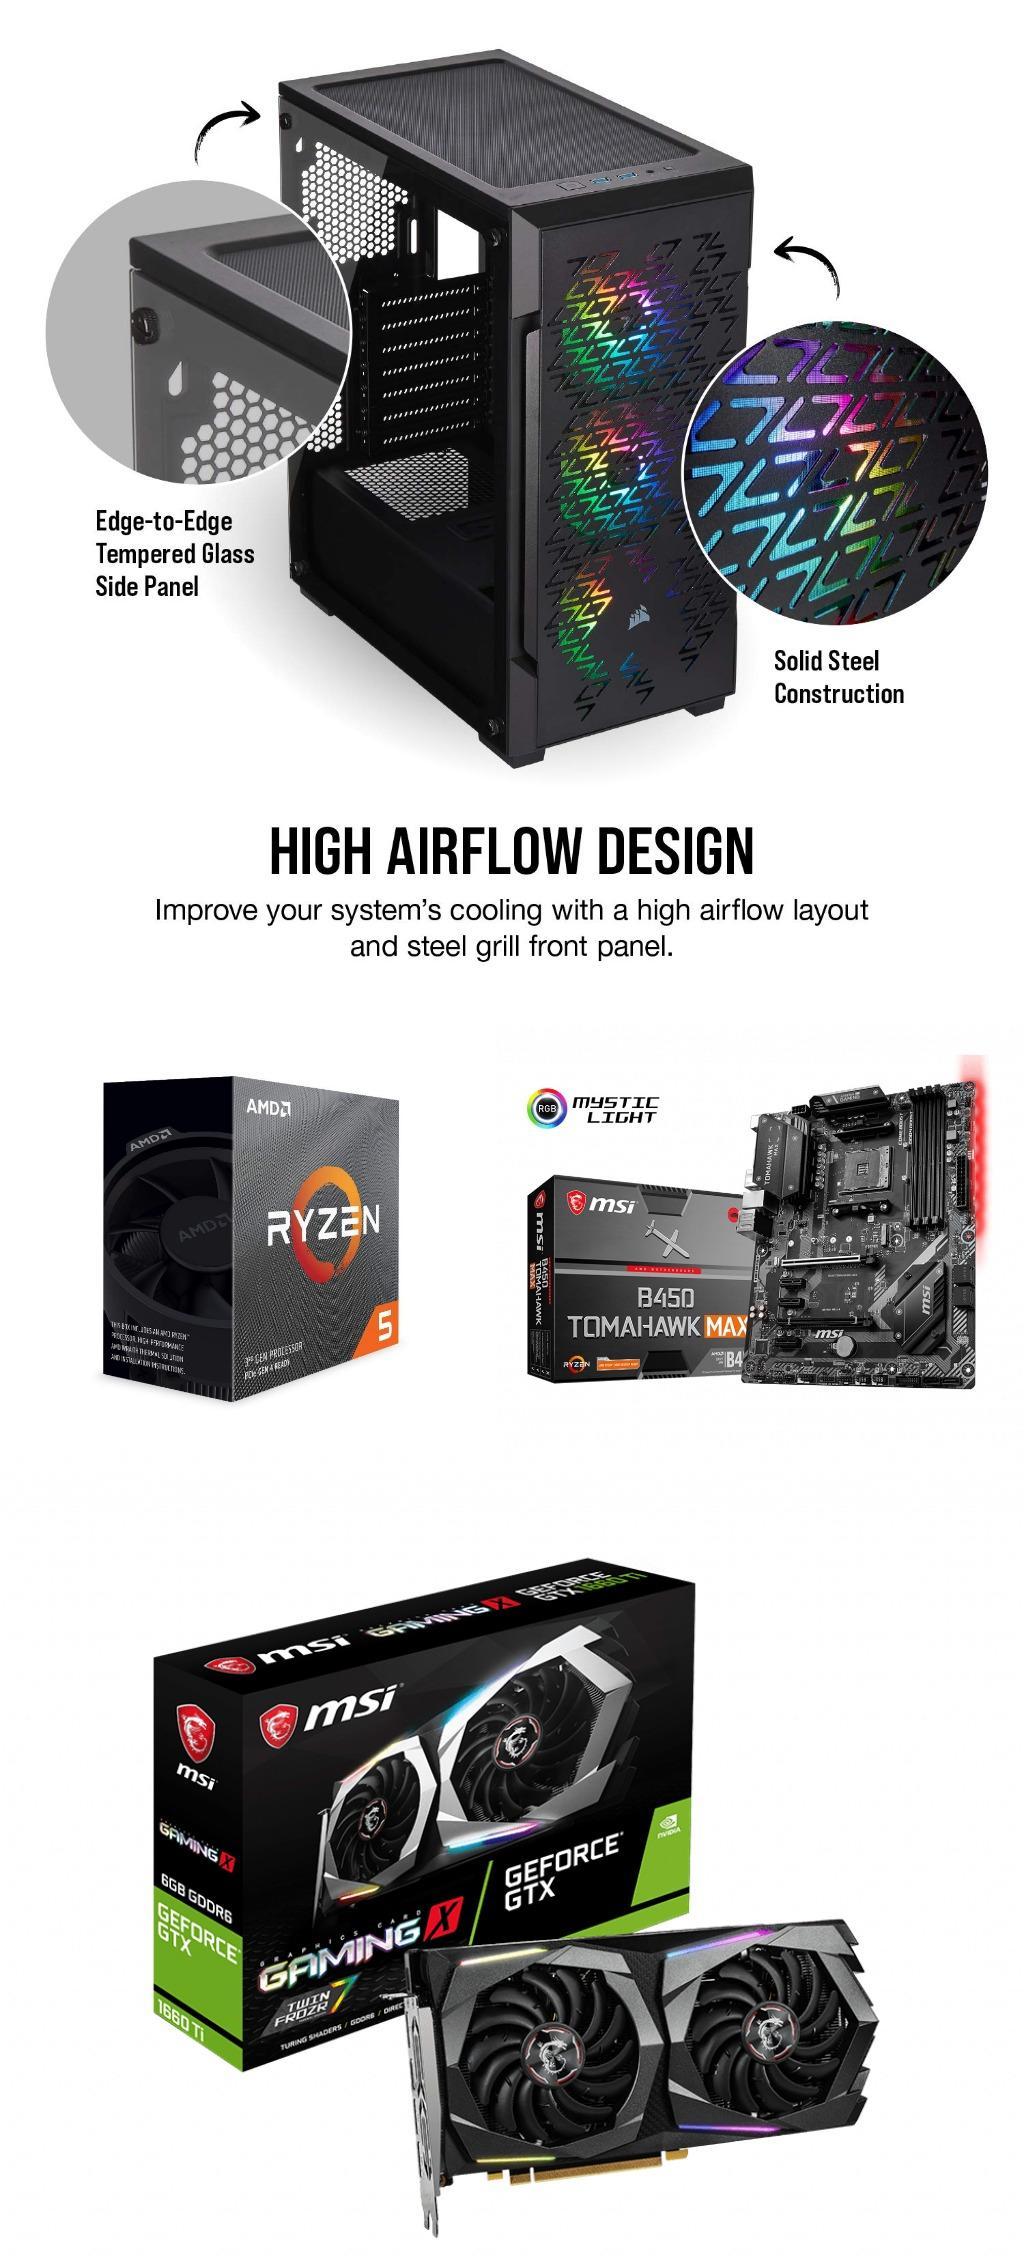 Corsair iCUE 220T RGB Airflow STEEL,Tempered Glass ATX Mid Tower Computer  Case, AMD Ryzen 5 3600, MSI B450 Tomahawk MAX, MSI 1660 ti Gaming x 6g